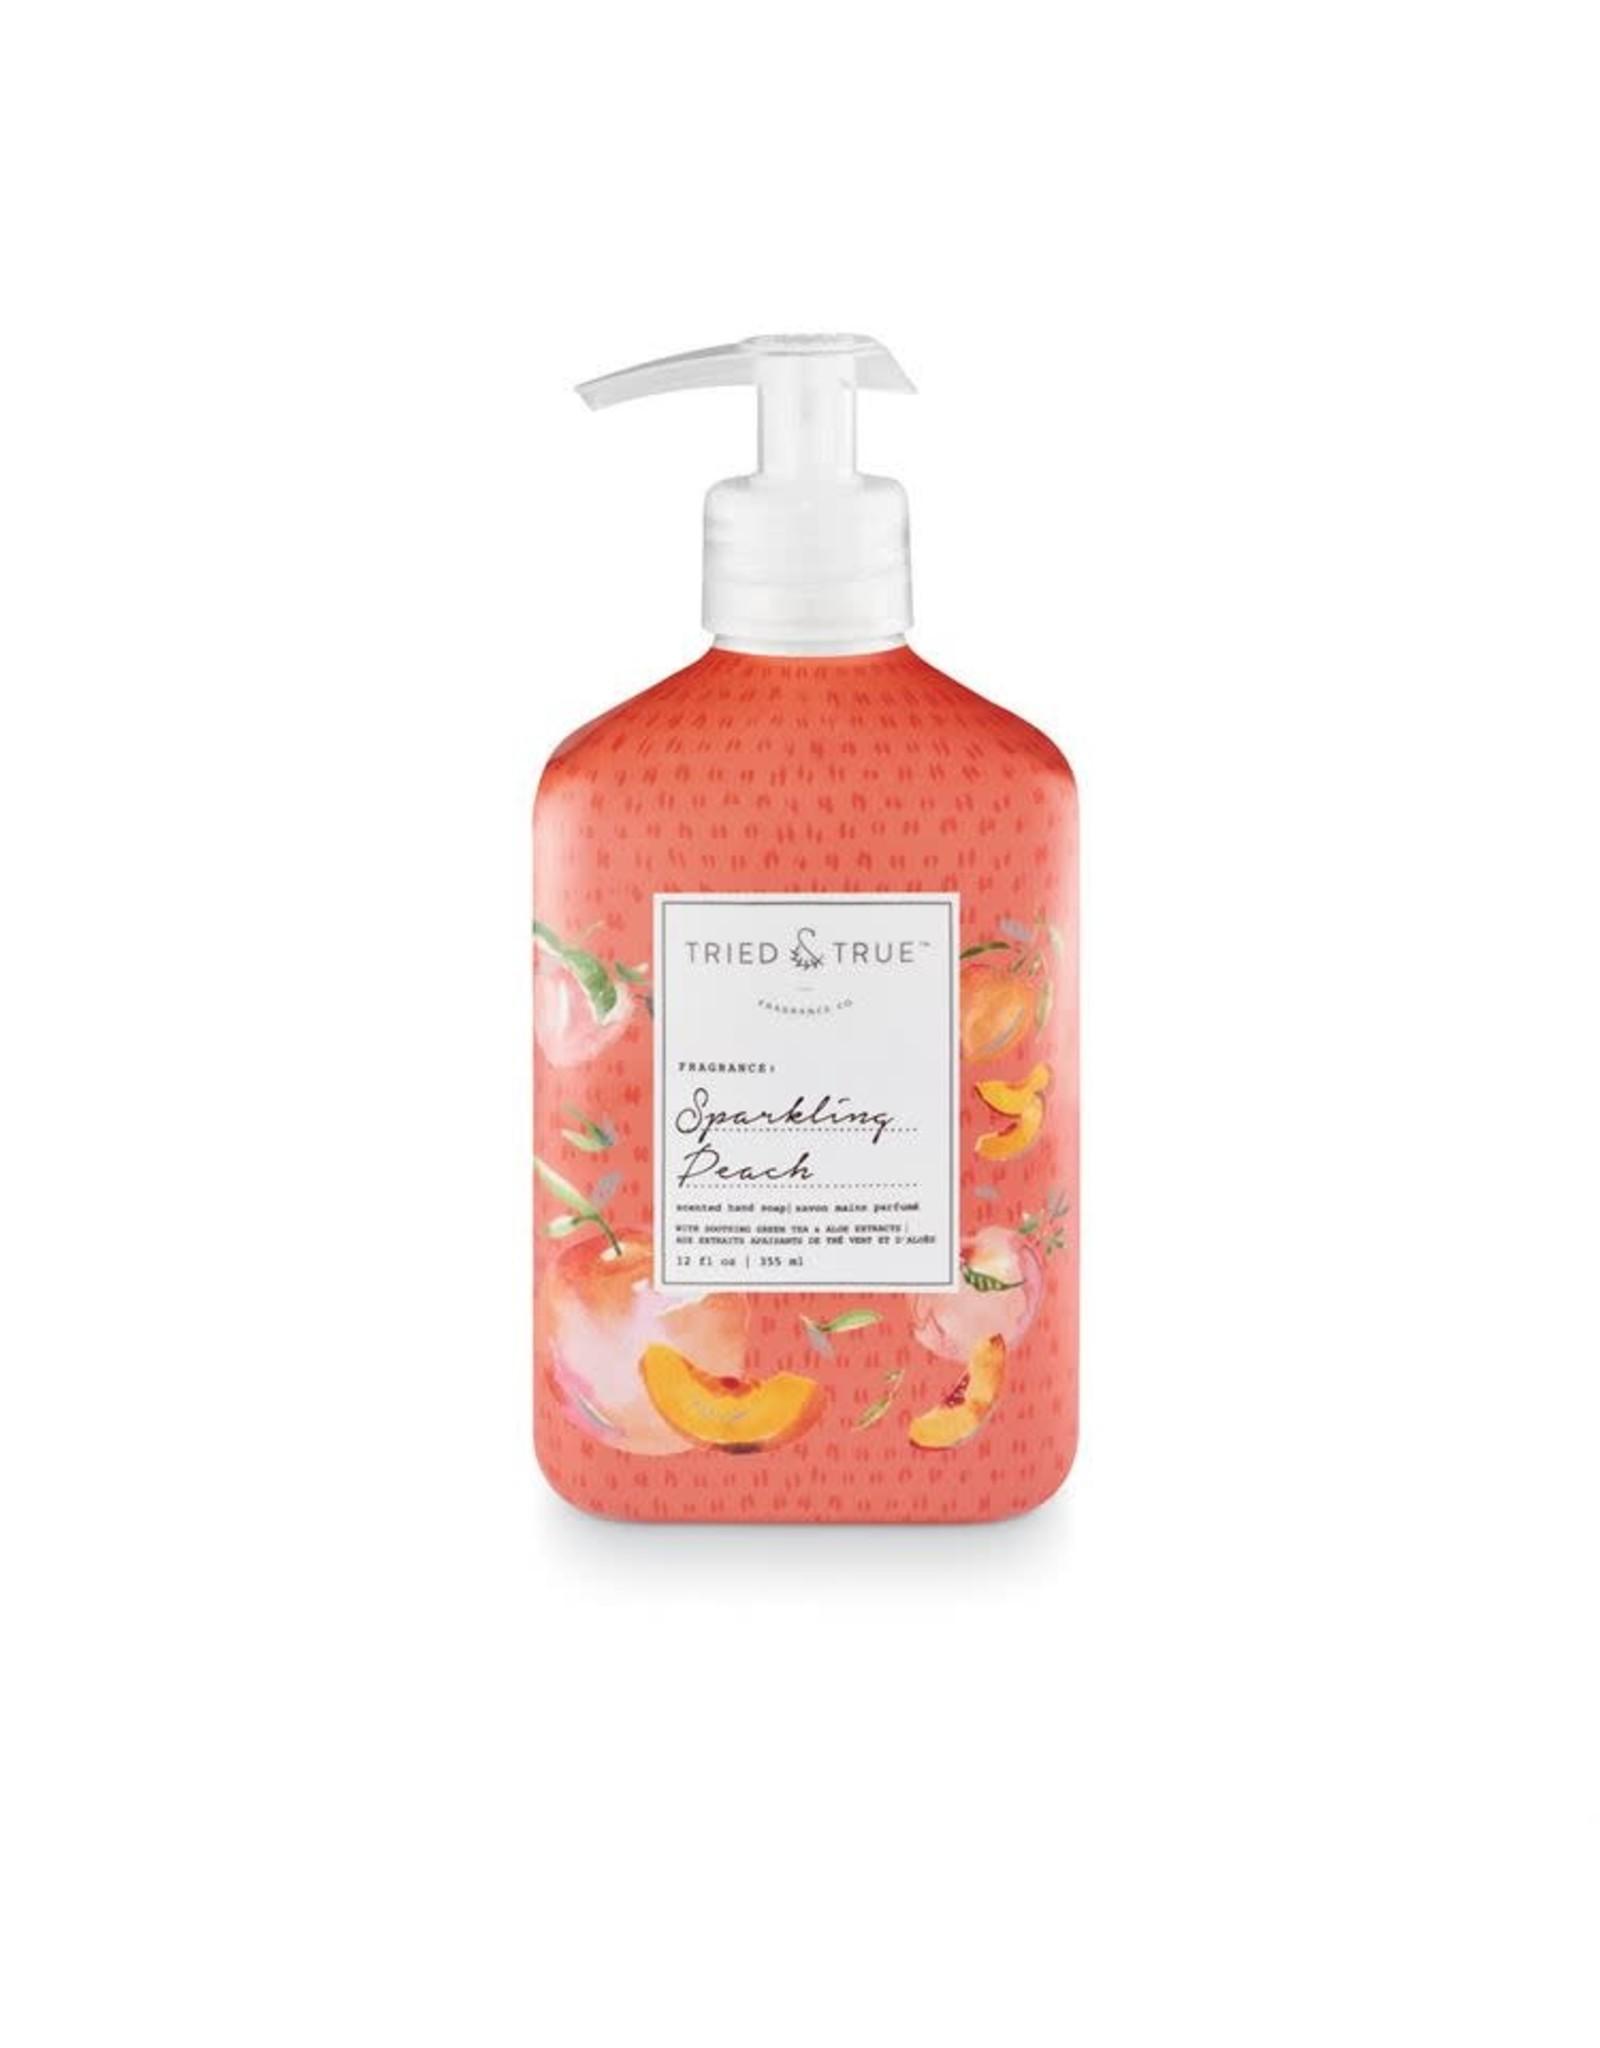 Tried & True 12 oz Hand Wash - Sparkling Peach